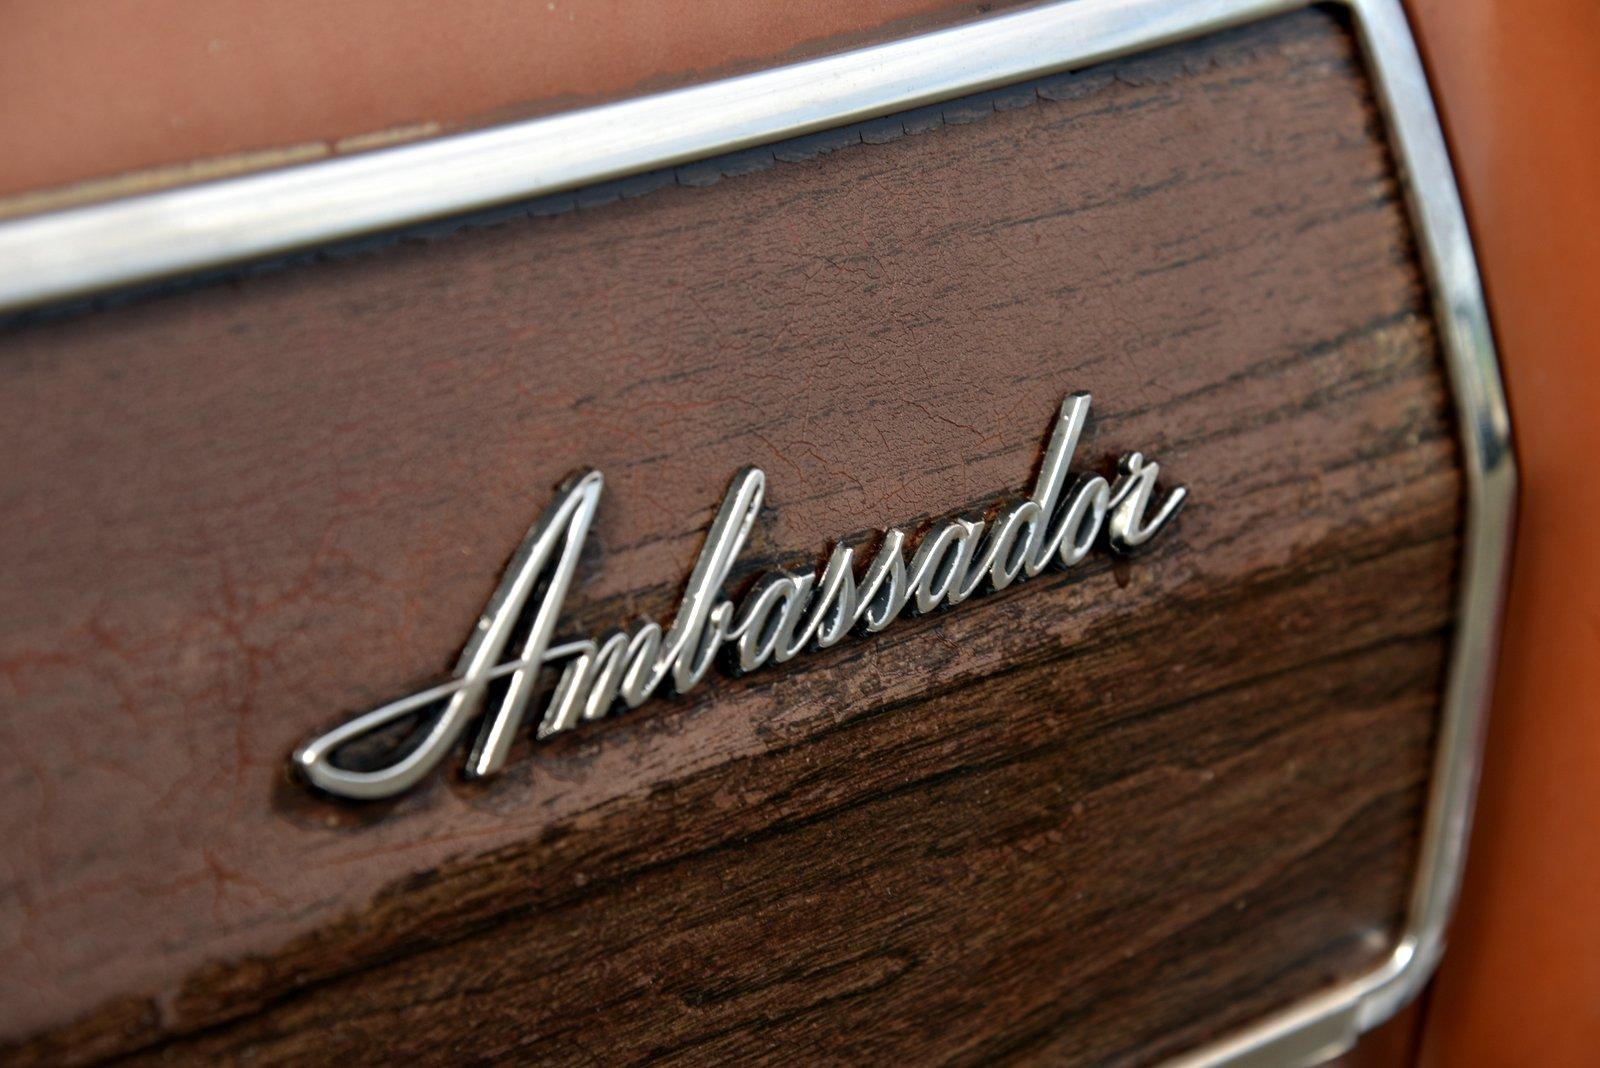 1972 AMC Ambassador Brougham Wagon badge